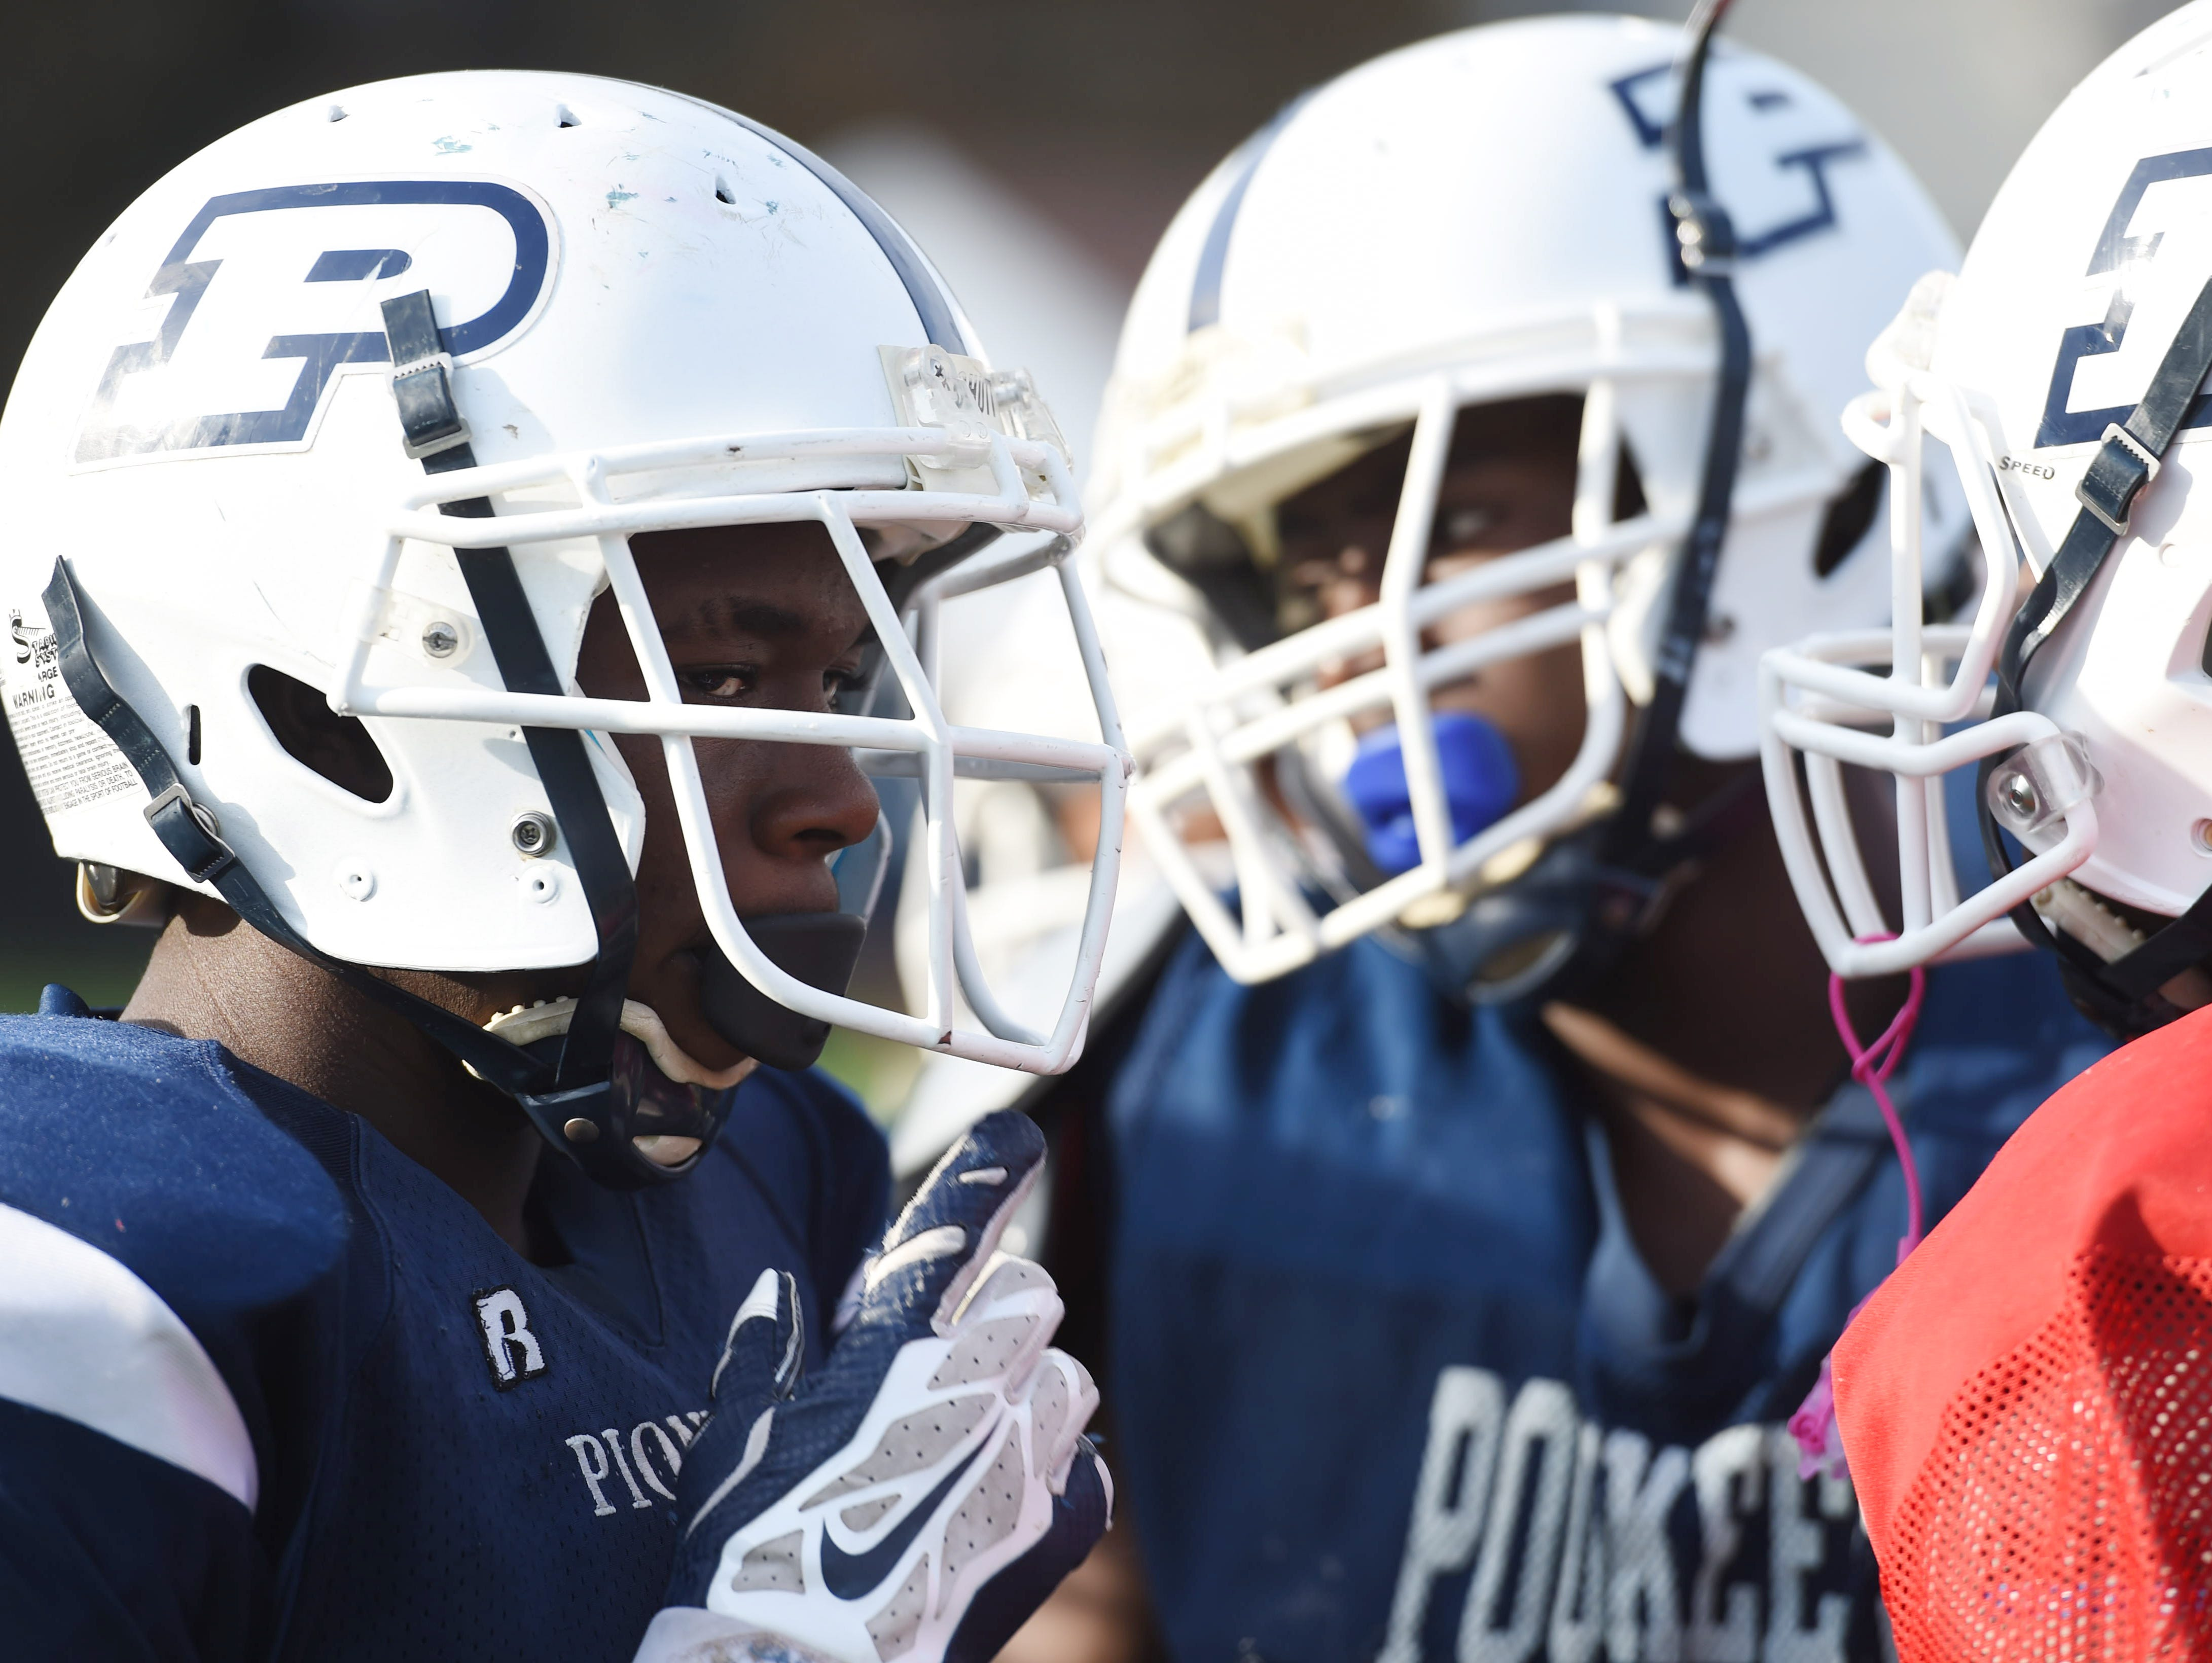 Poughkeepsie's Shaquez Nesbitt during practice at Poughkeepsie High School on Wednesday.